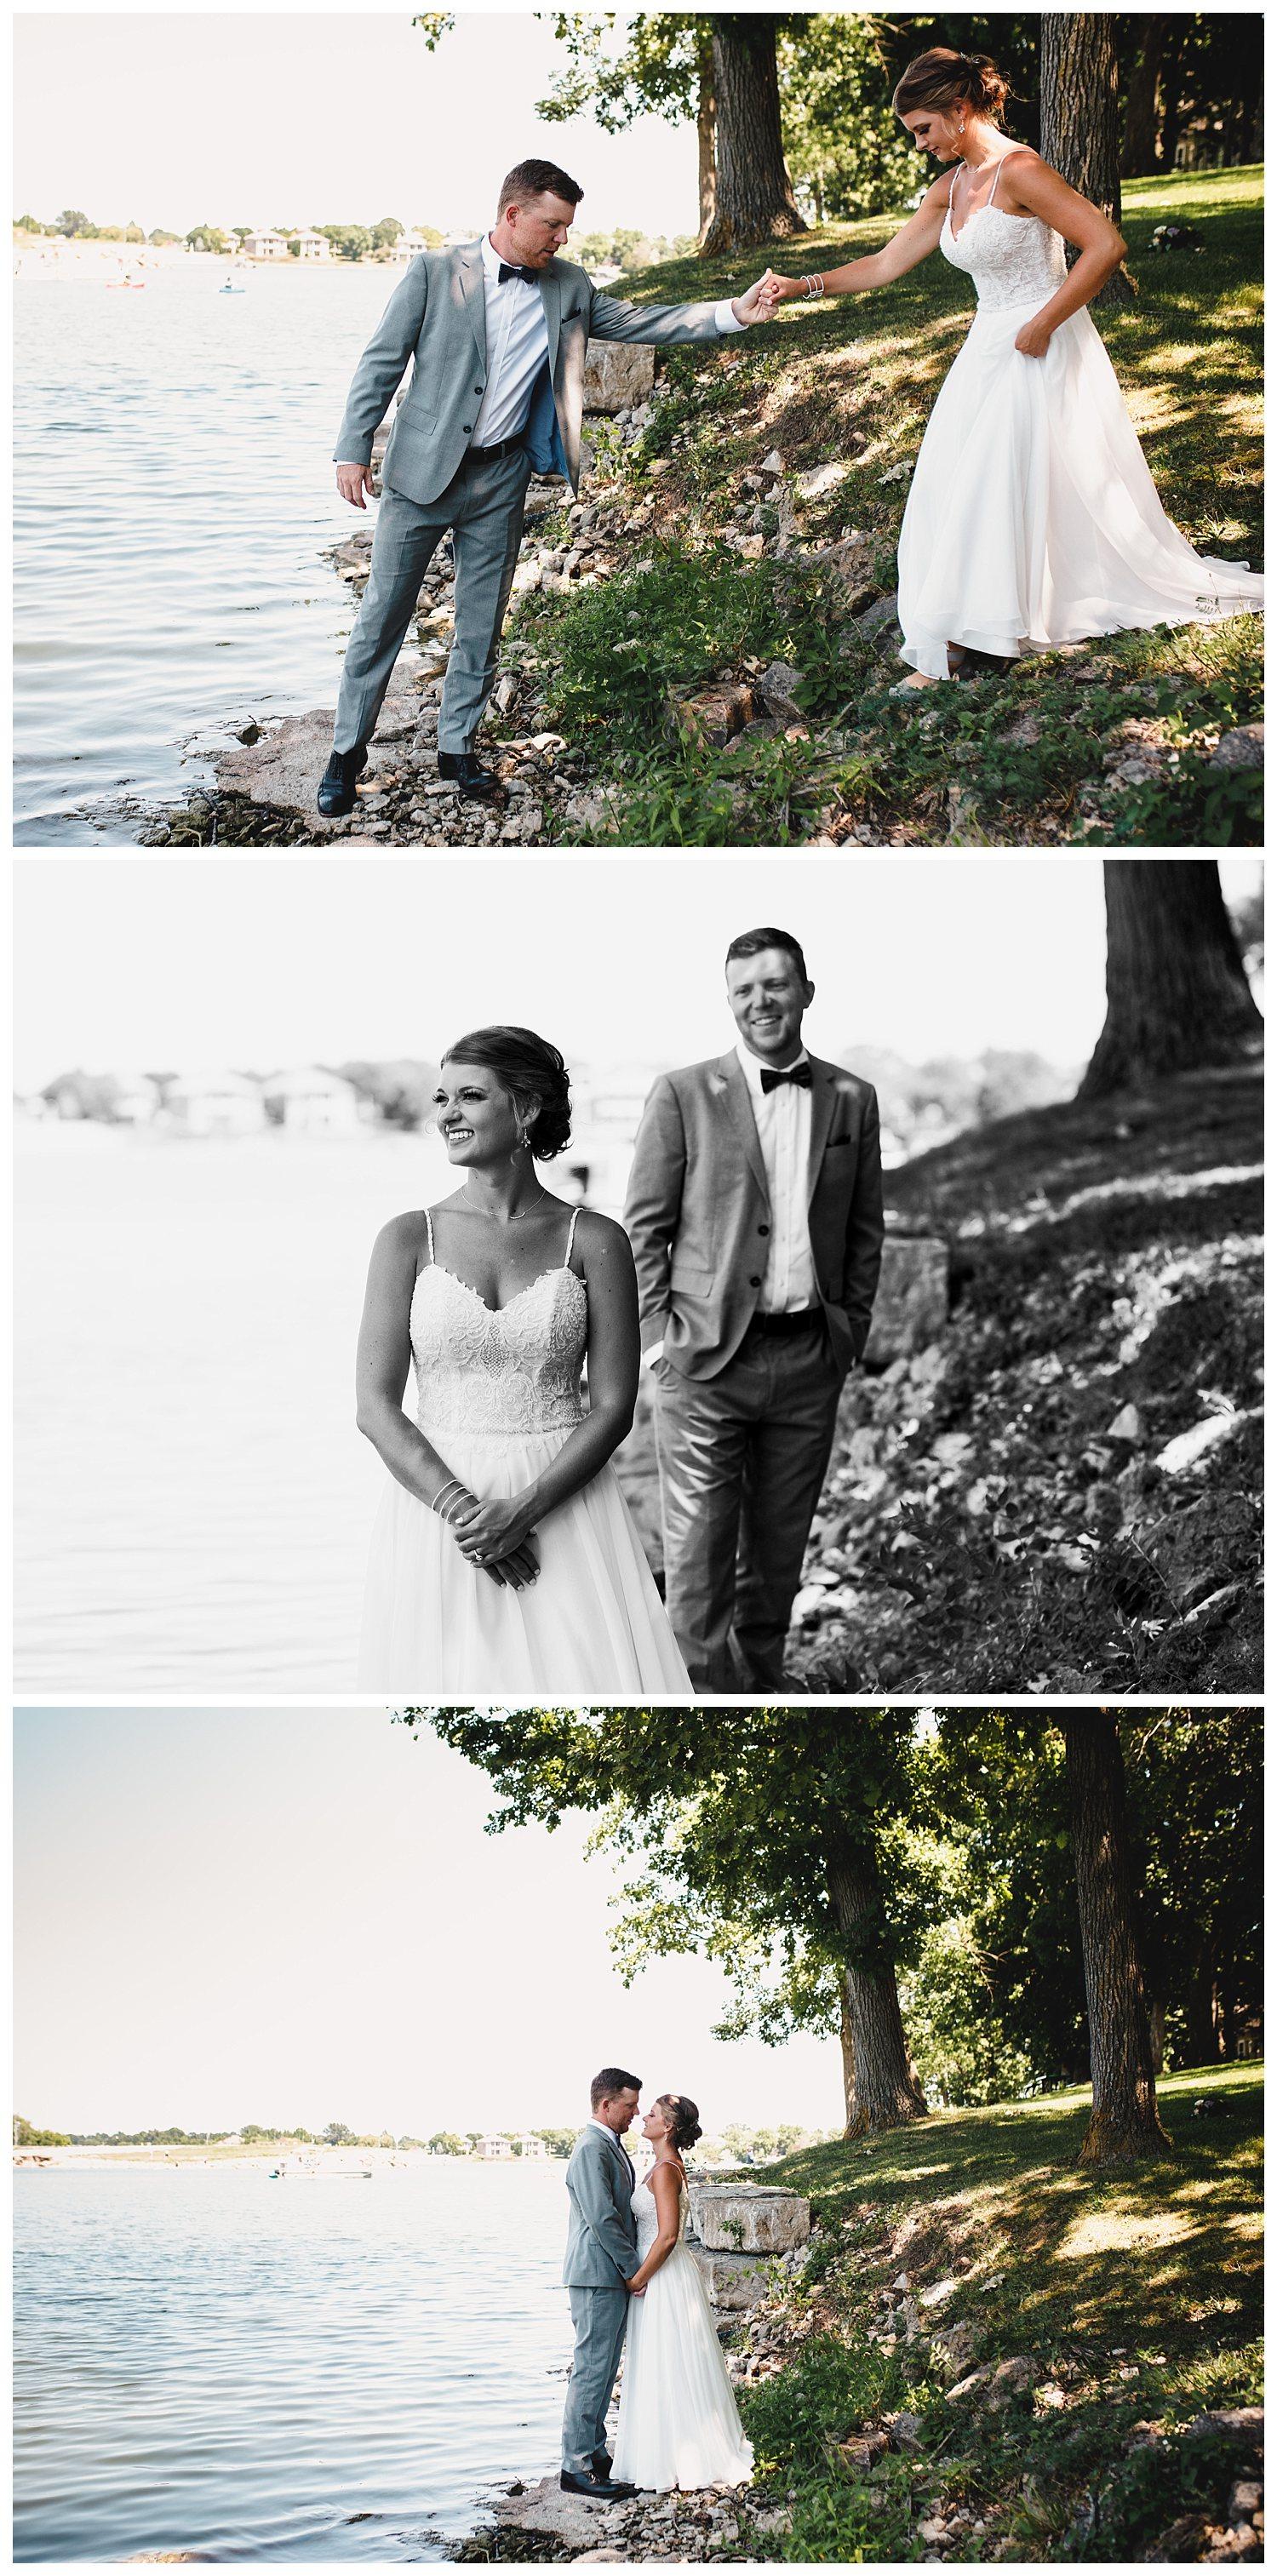 Kelsey_Diane_Photography_Kansas_City_Engagement_Wedding_Photographer_Midwest_Traveling_Missouri_Lee_Andrew_Hall_And_Garden_Blue_Springs_Wedding_Clayton_Kimberly_Summer_Wedding_0822.jpg